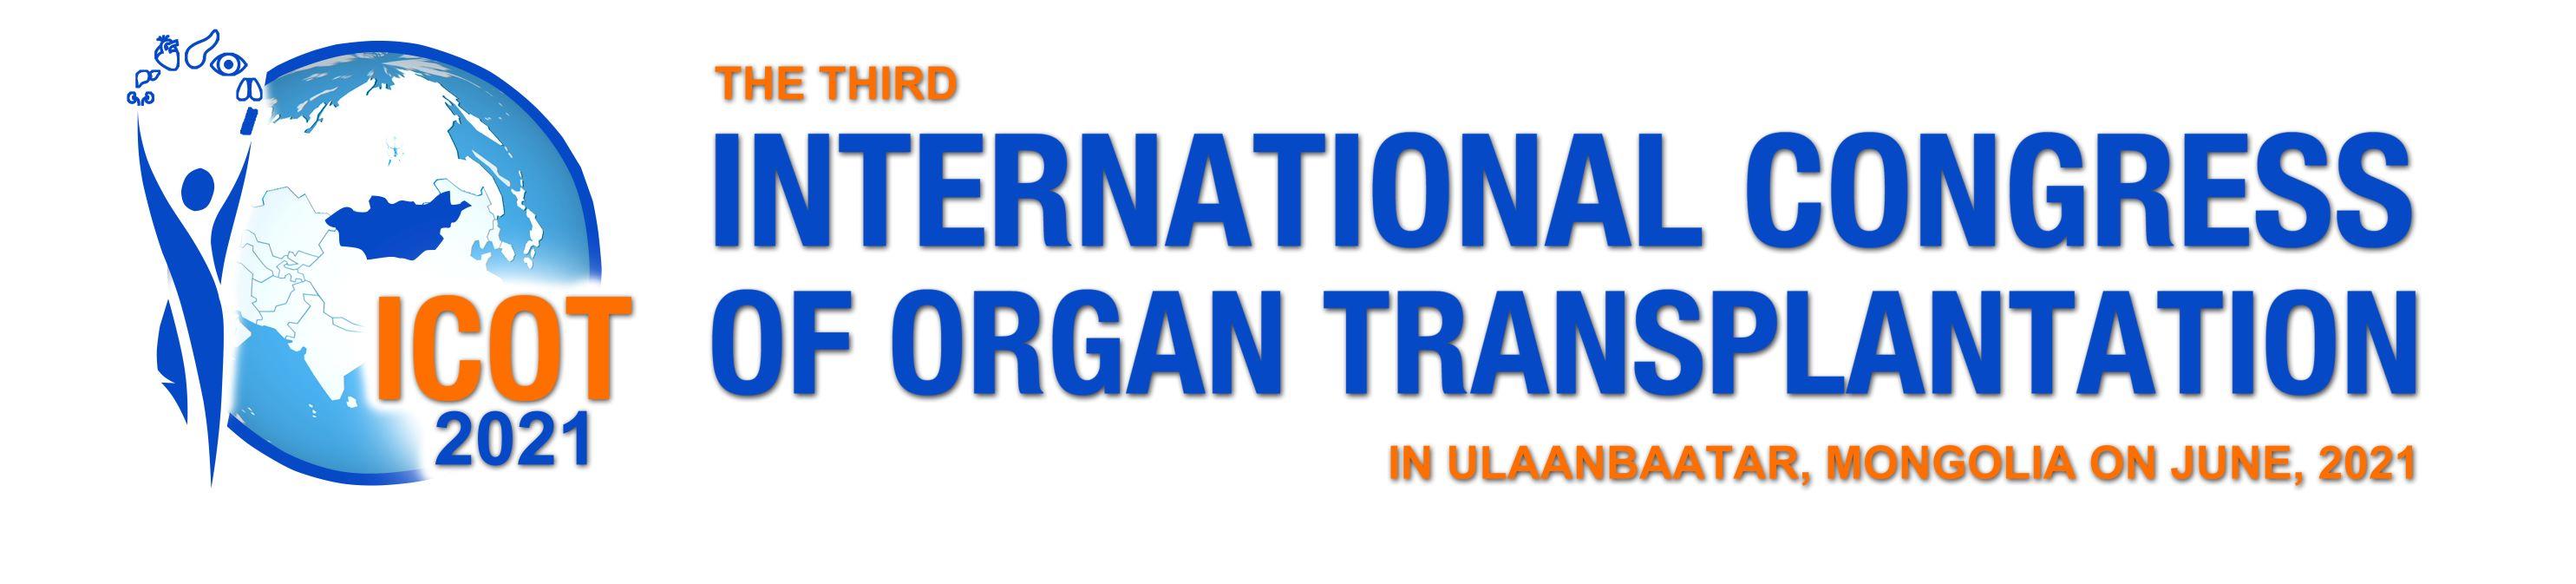 ICOT | International Congress of Organ Transplantation